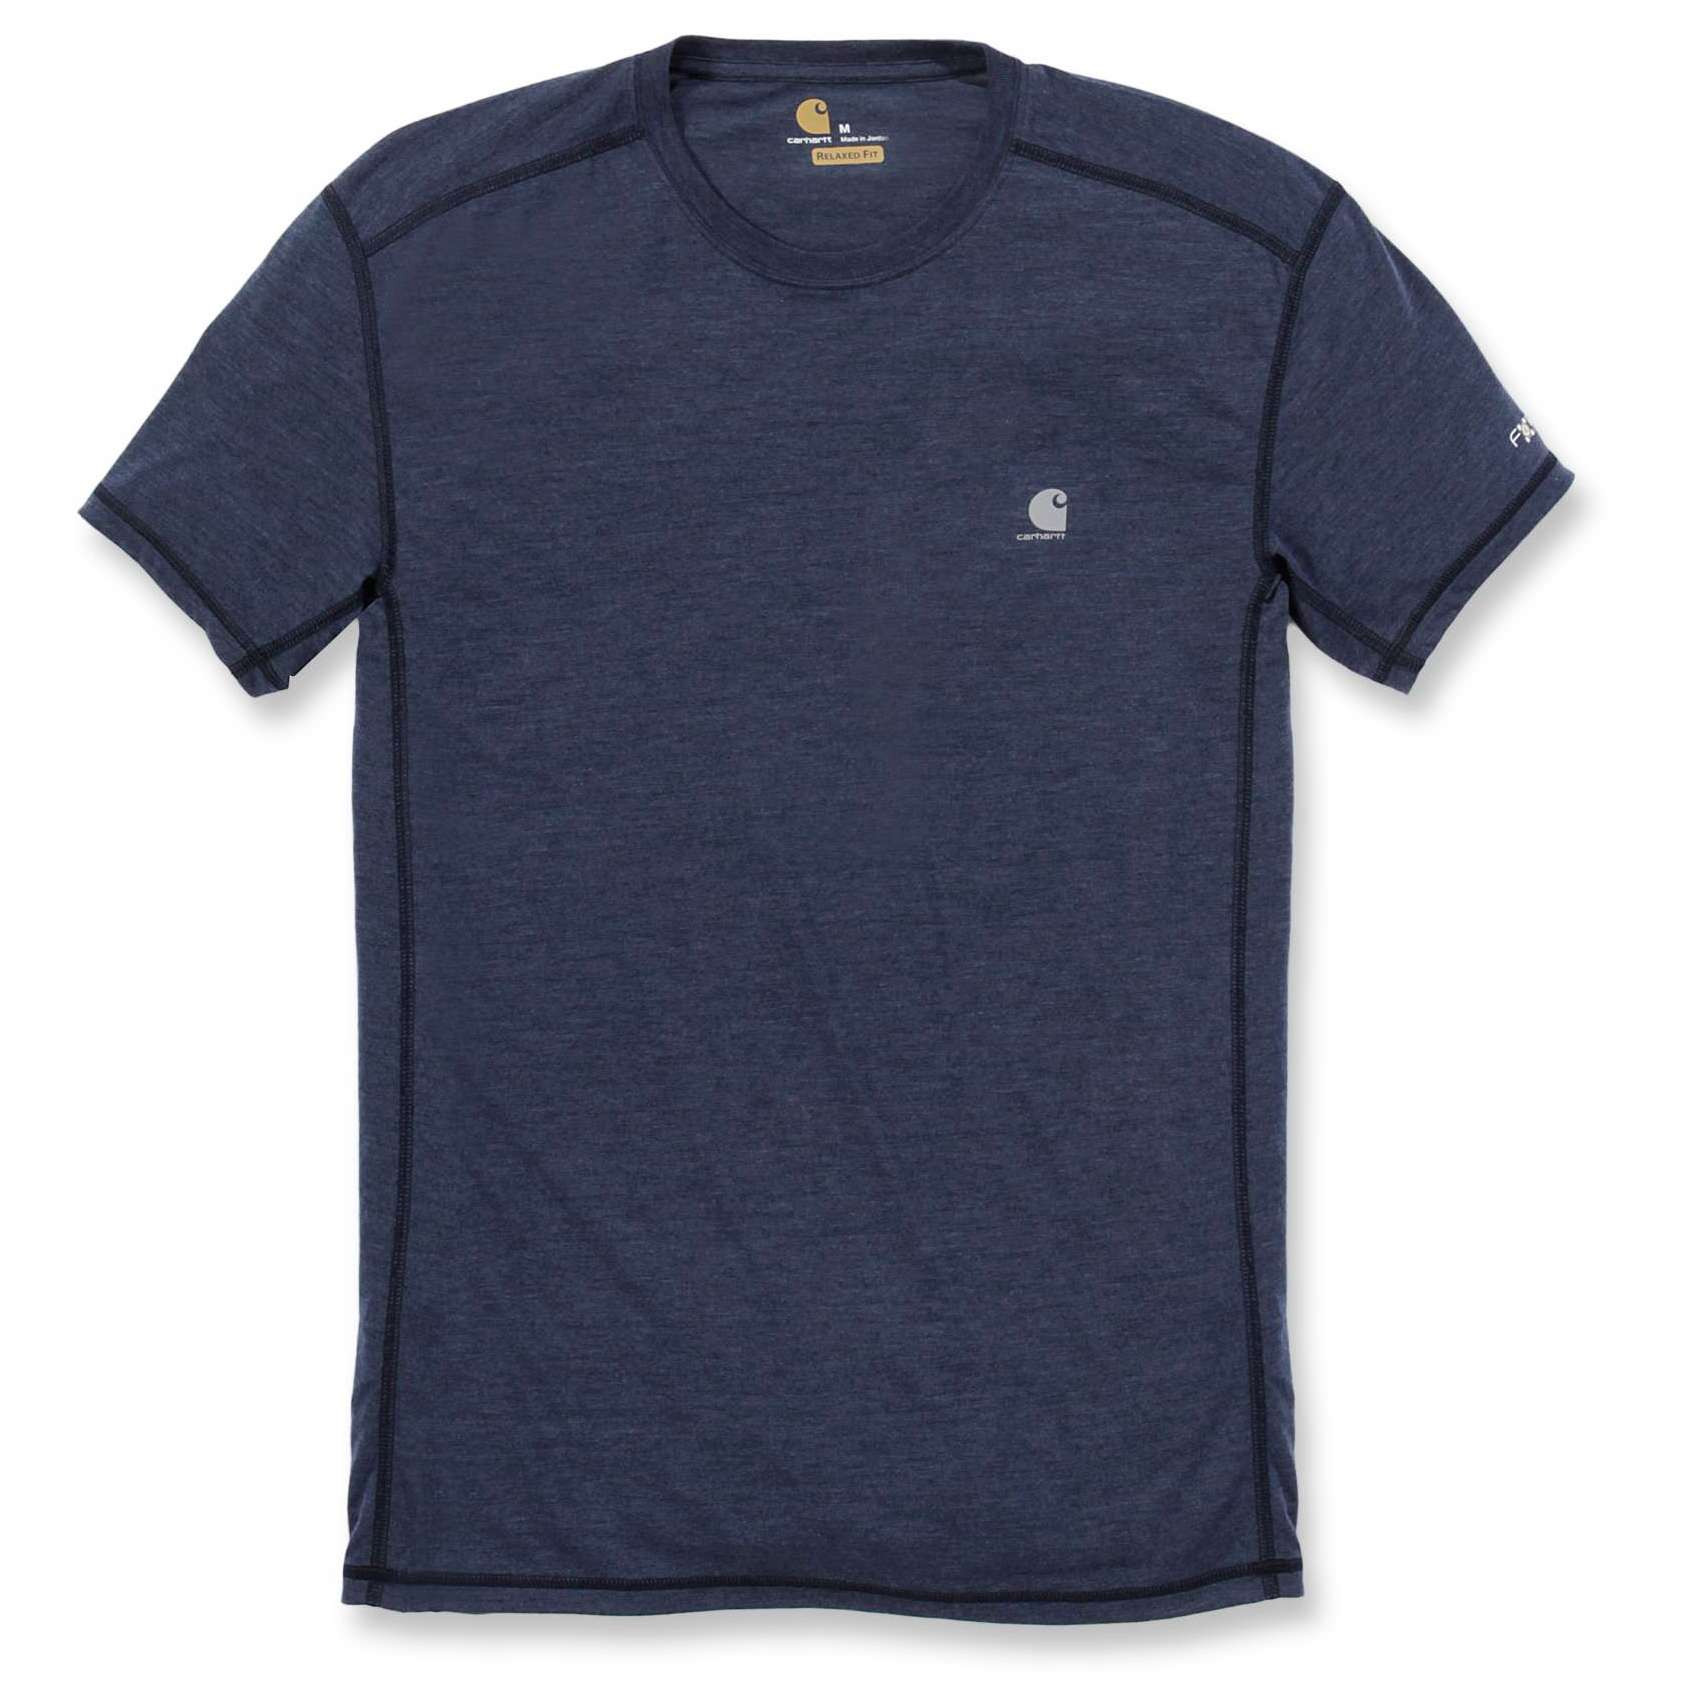 Футболка Carhartt Force Extremes T-Shirt S/S - 102960 (Navy Heather; S)